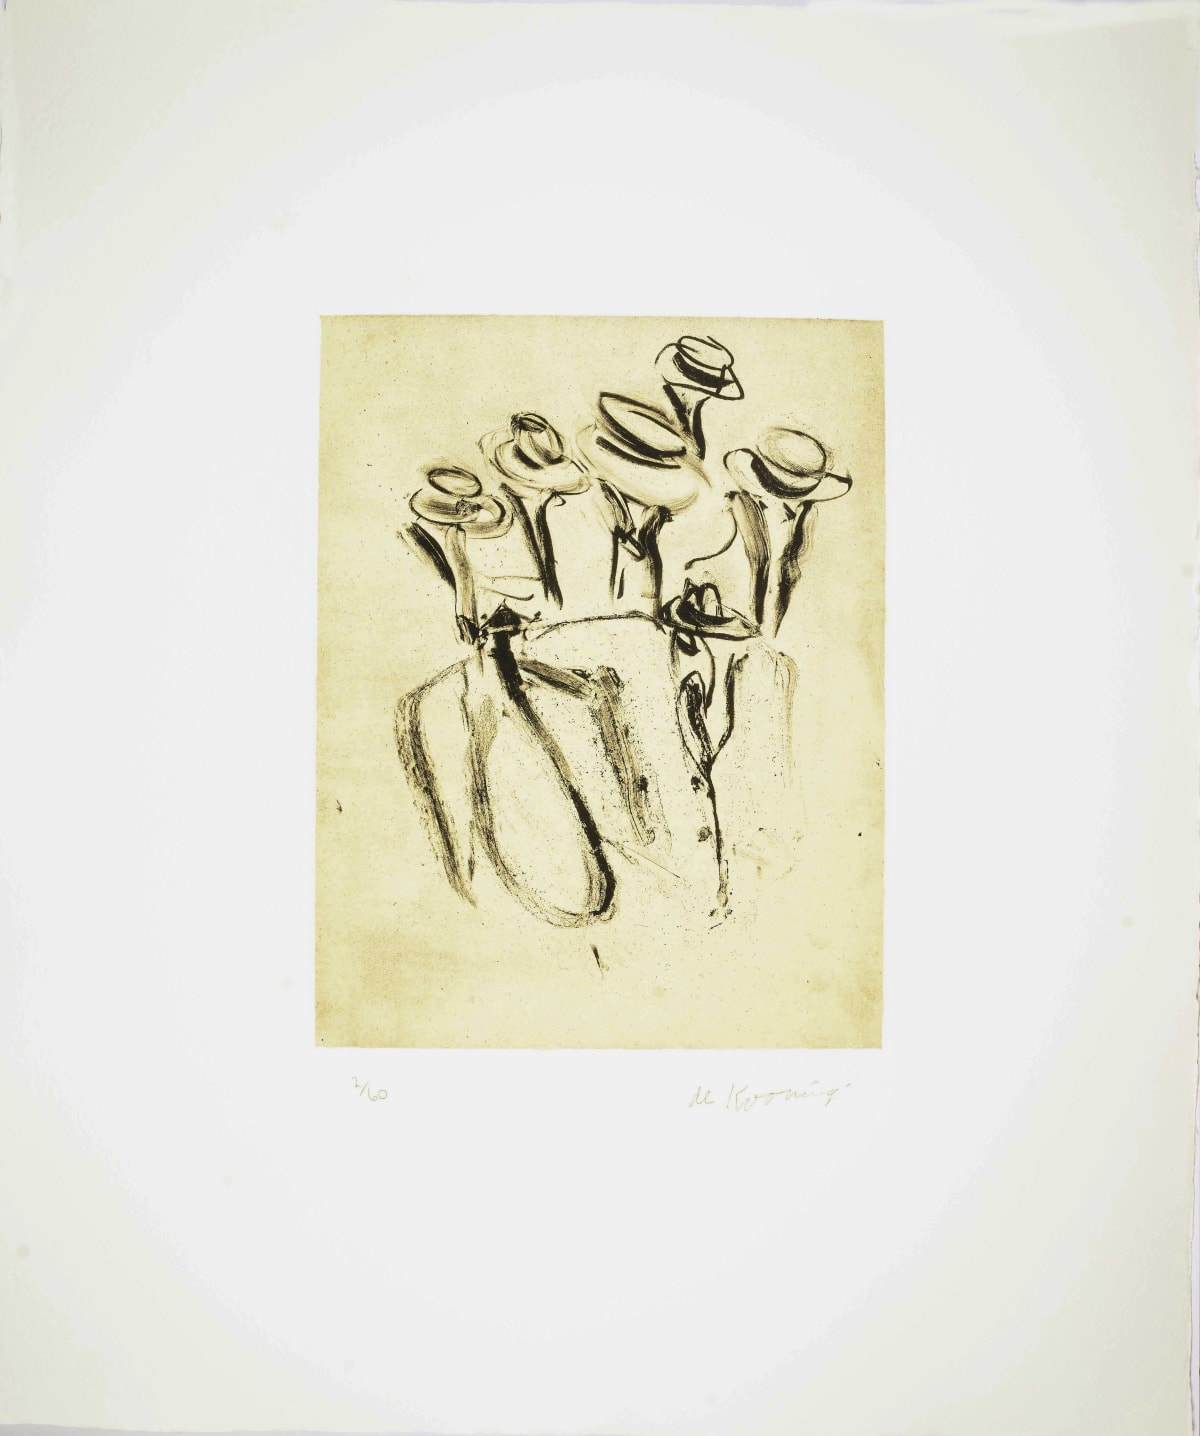 Willem de Kooning, Seventeen Lithographs for Frank O'Hara: Plate II, 1988